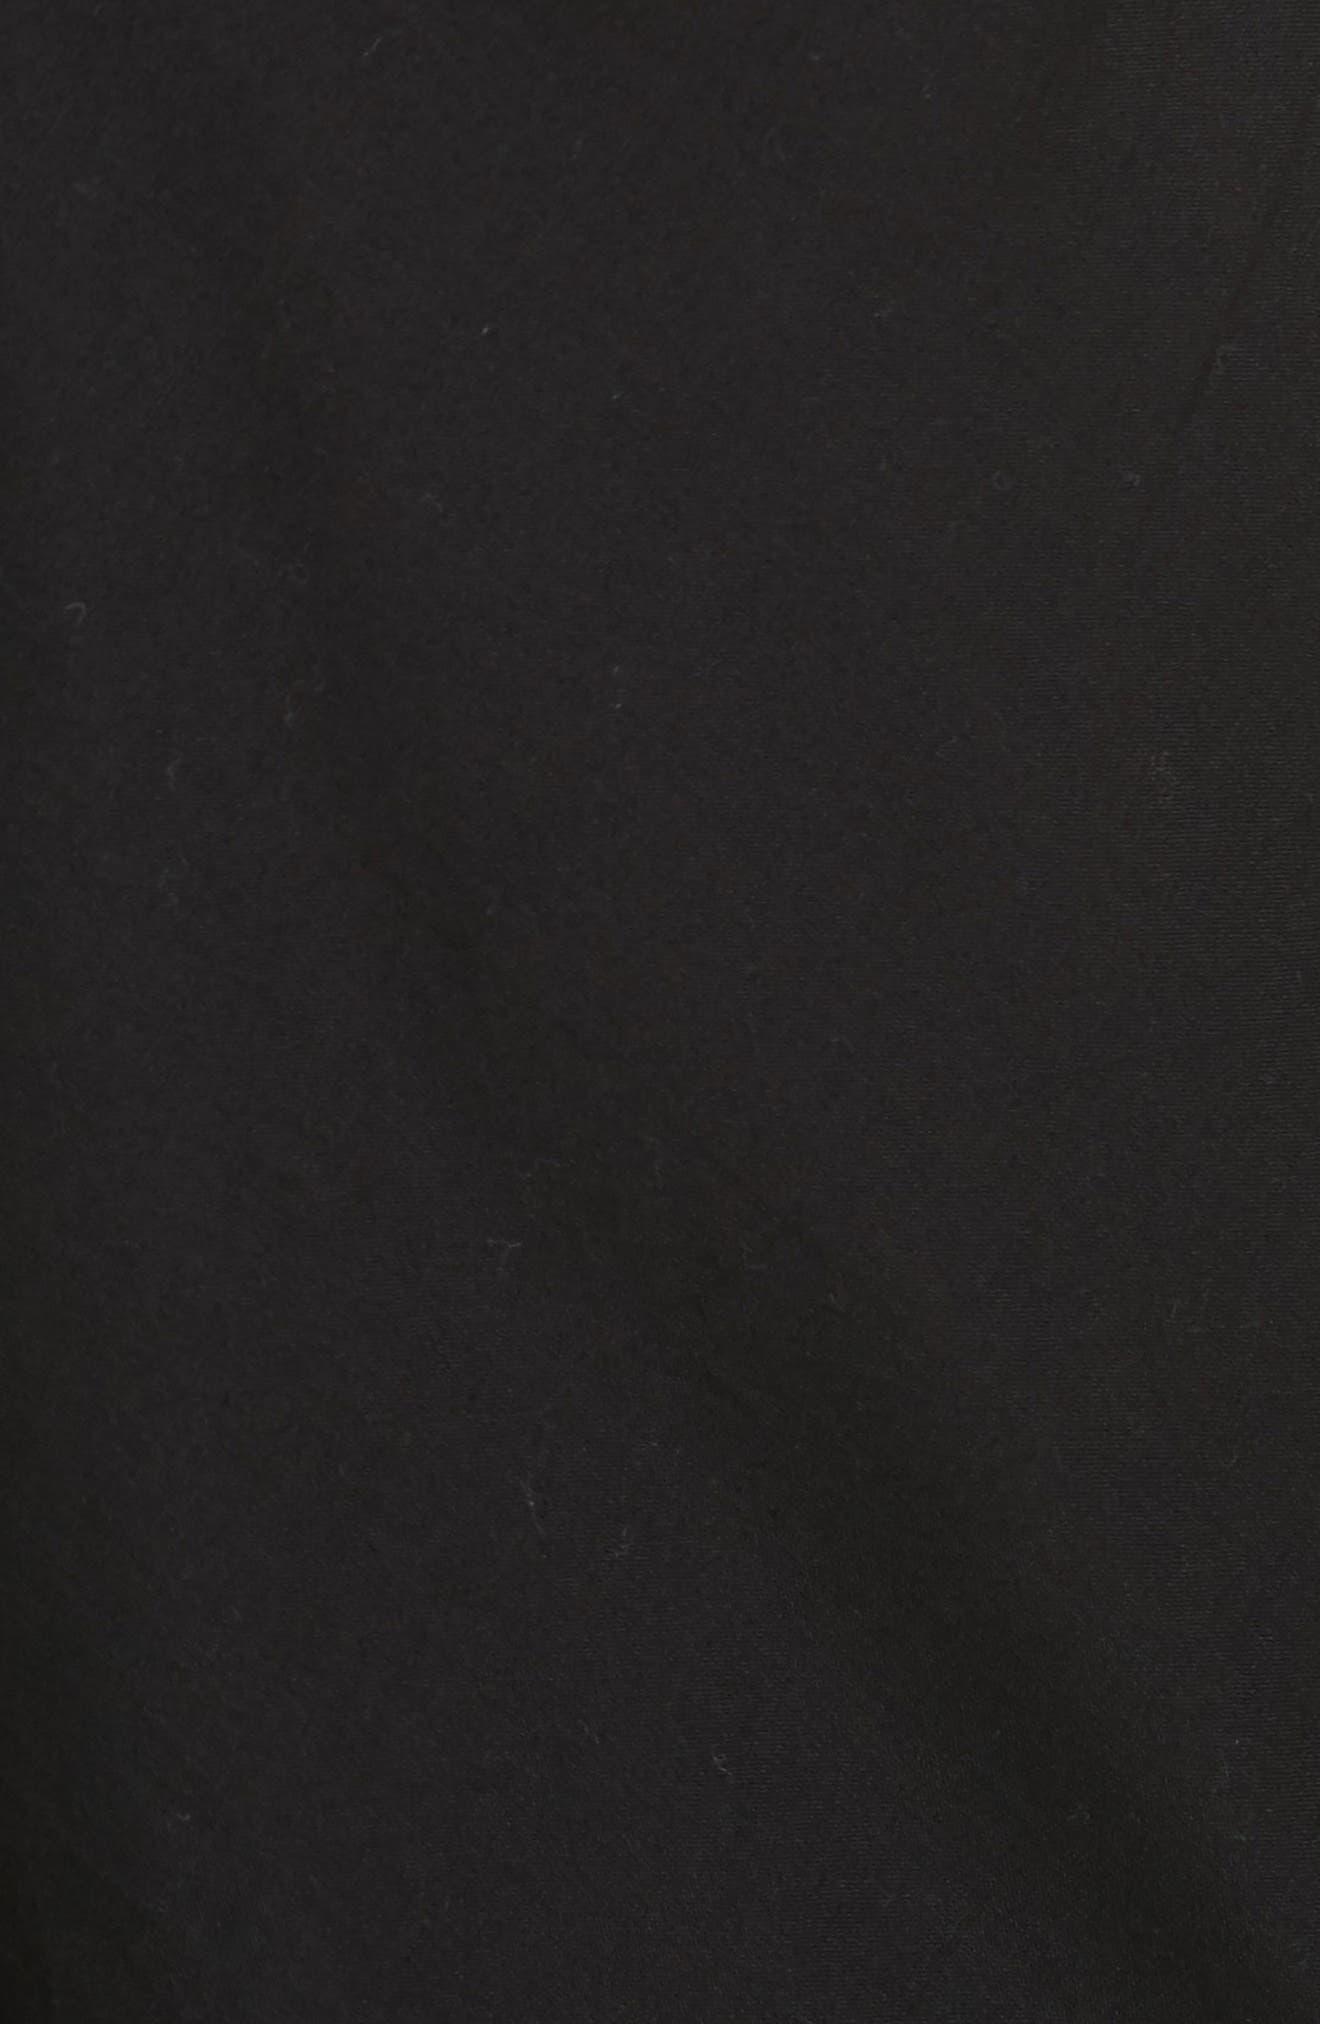 Overlay Shorts,                             Alternate thumbnail 5, color,                             Black